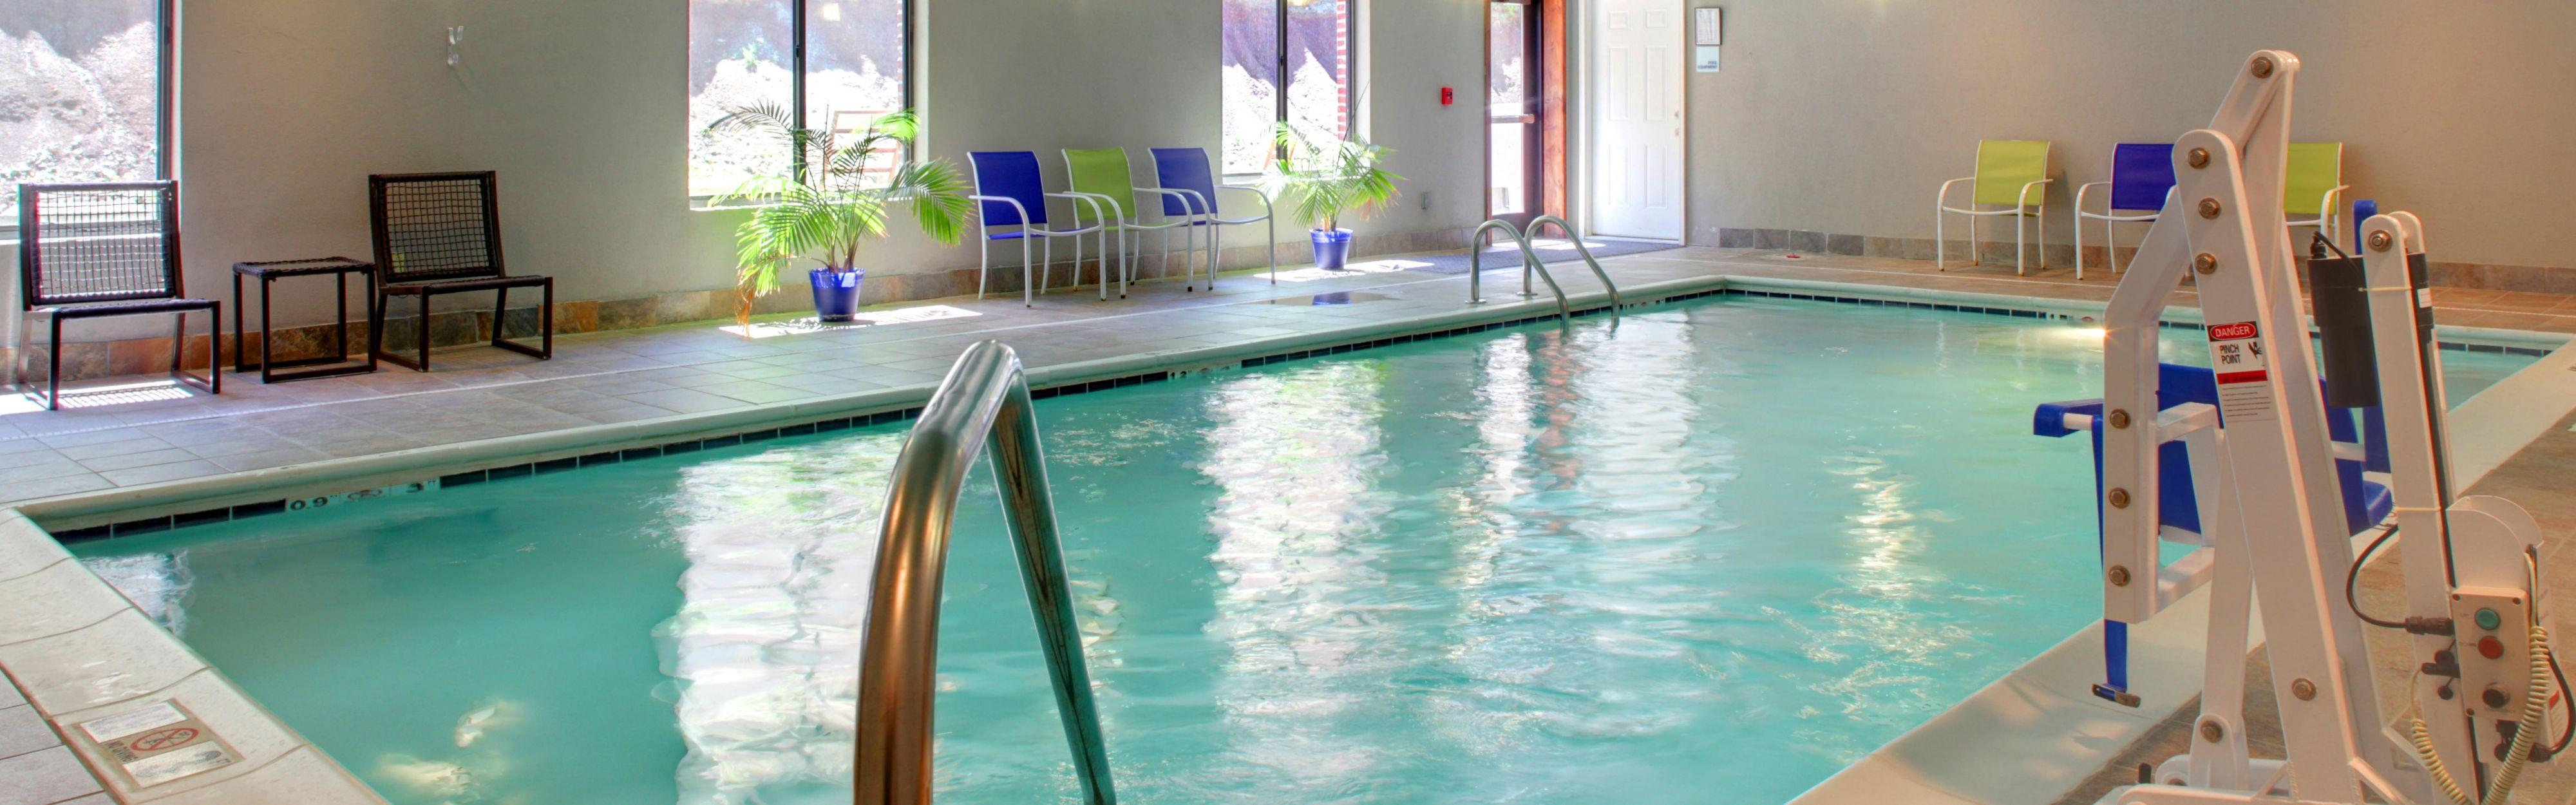 Holiday Inn Express & Suites Charleston NW - Cross Lanes image 1